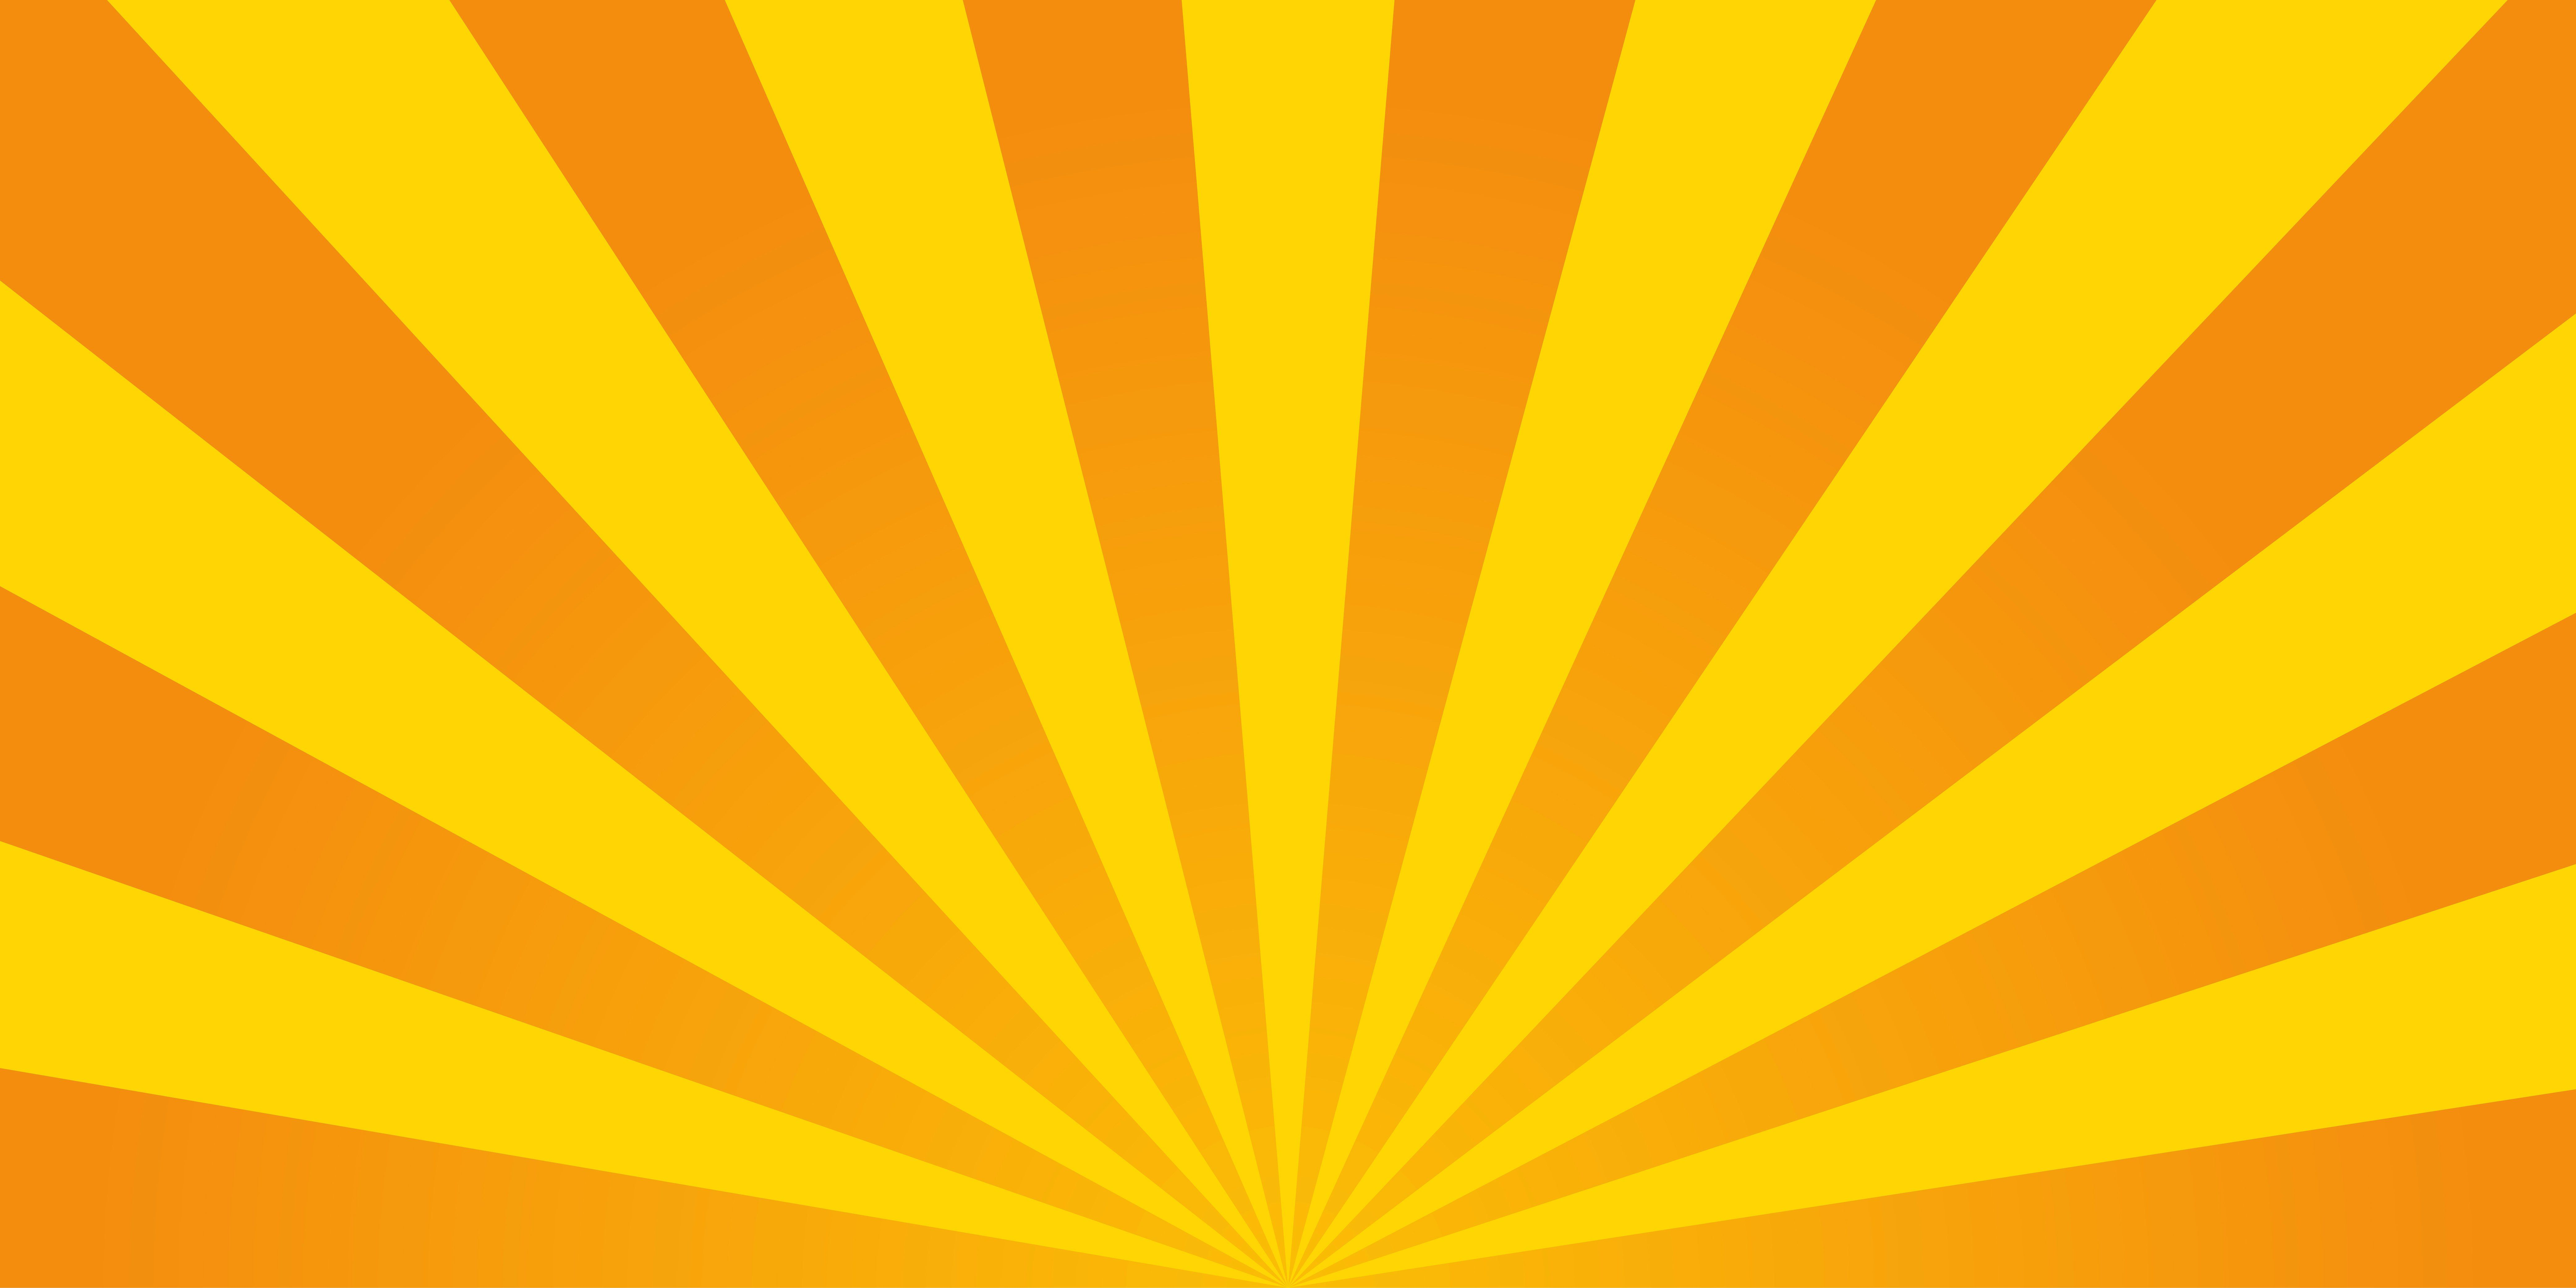 Retro ray orange background by vivat on @creativemarket in ...